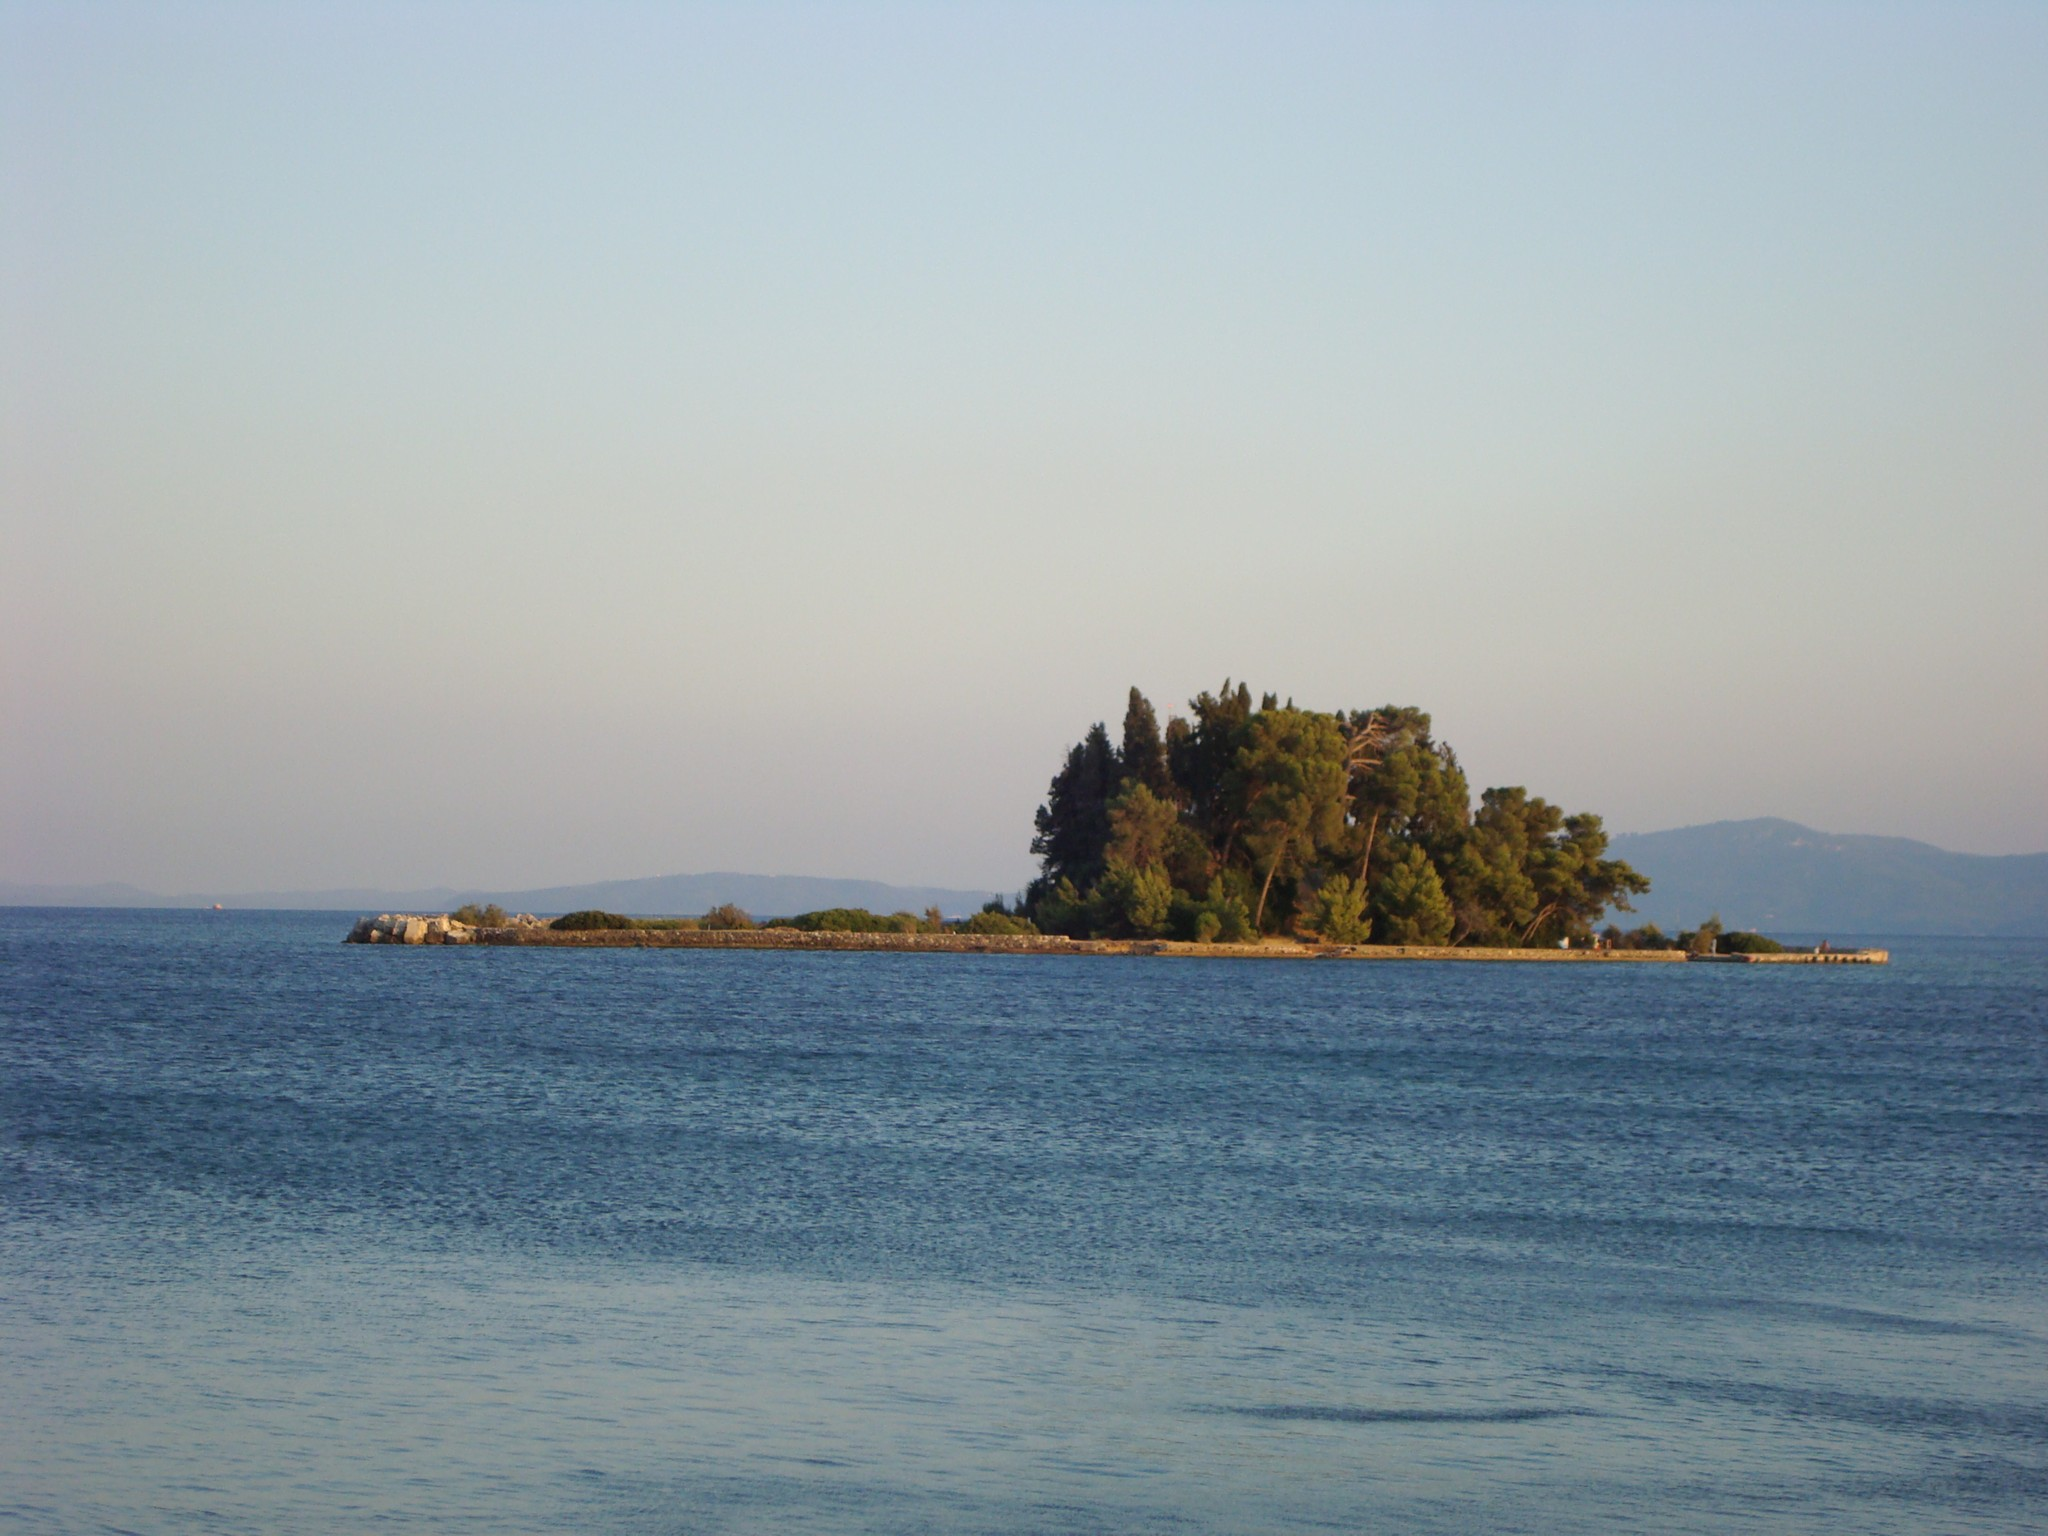 File:Pontikonisi - Mouse island, Corfu 1.JPG - Wikimedia ...